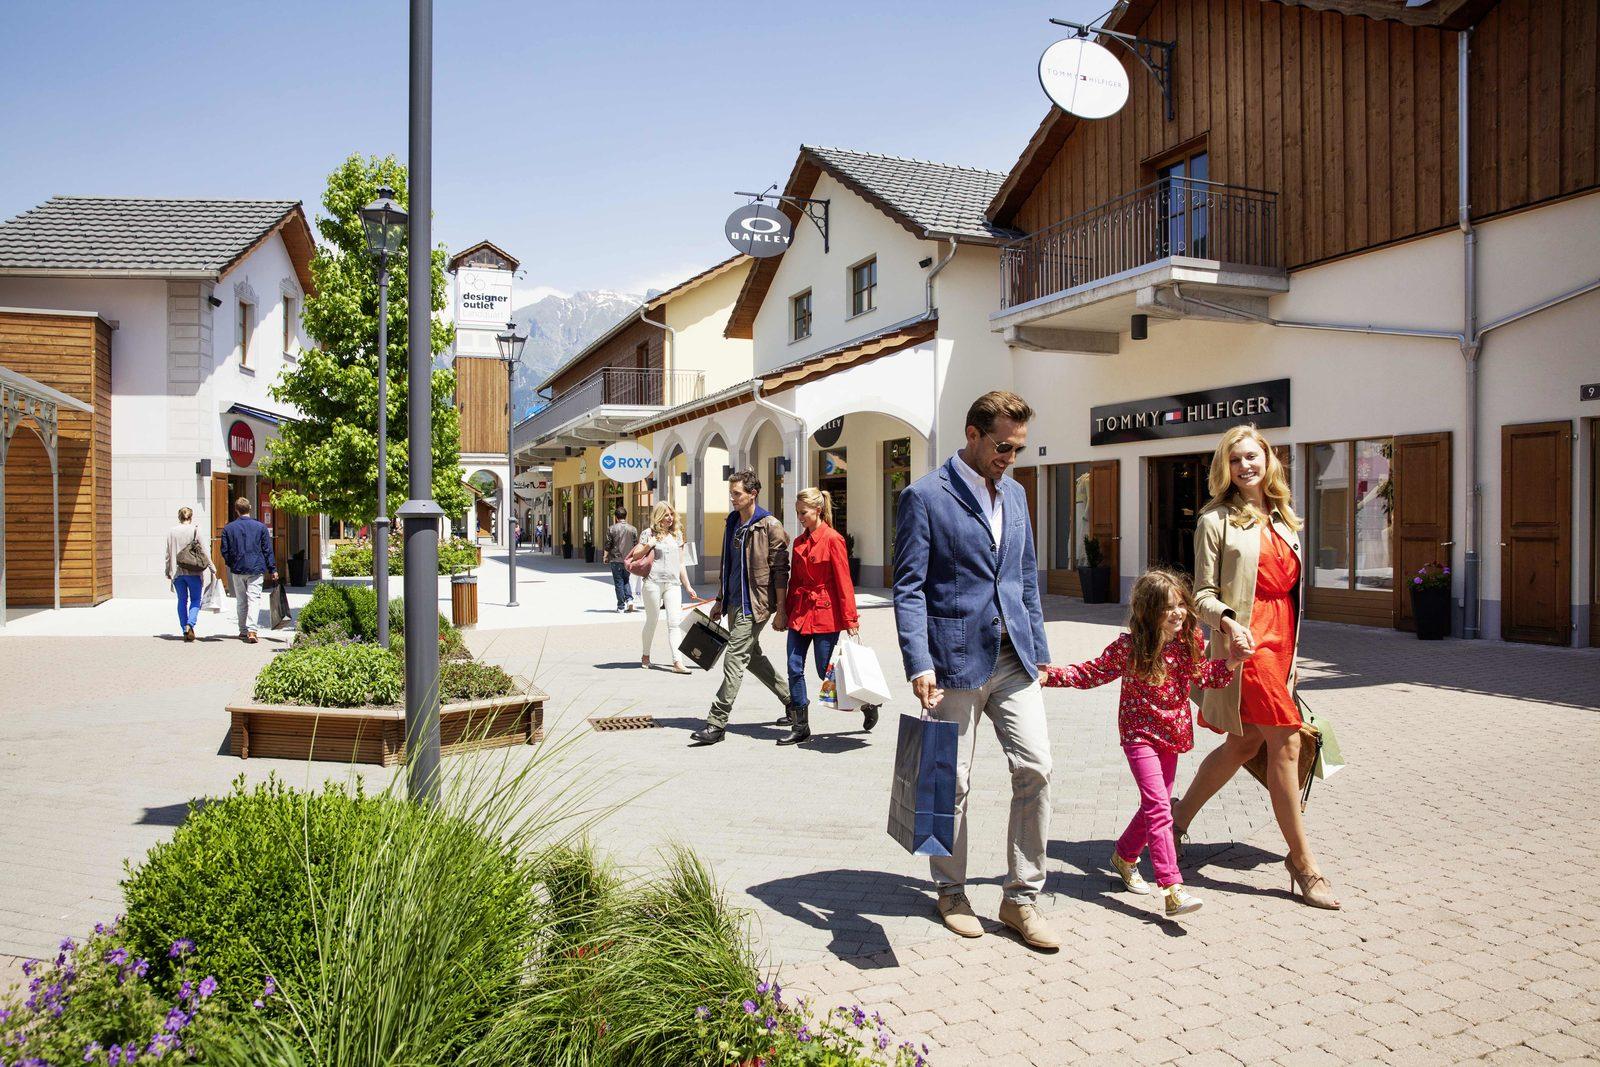 Luzern shopping centre